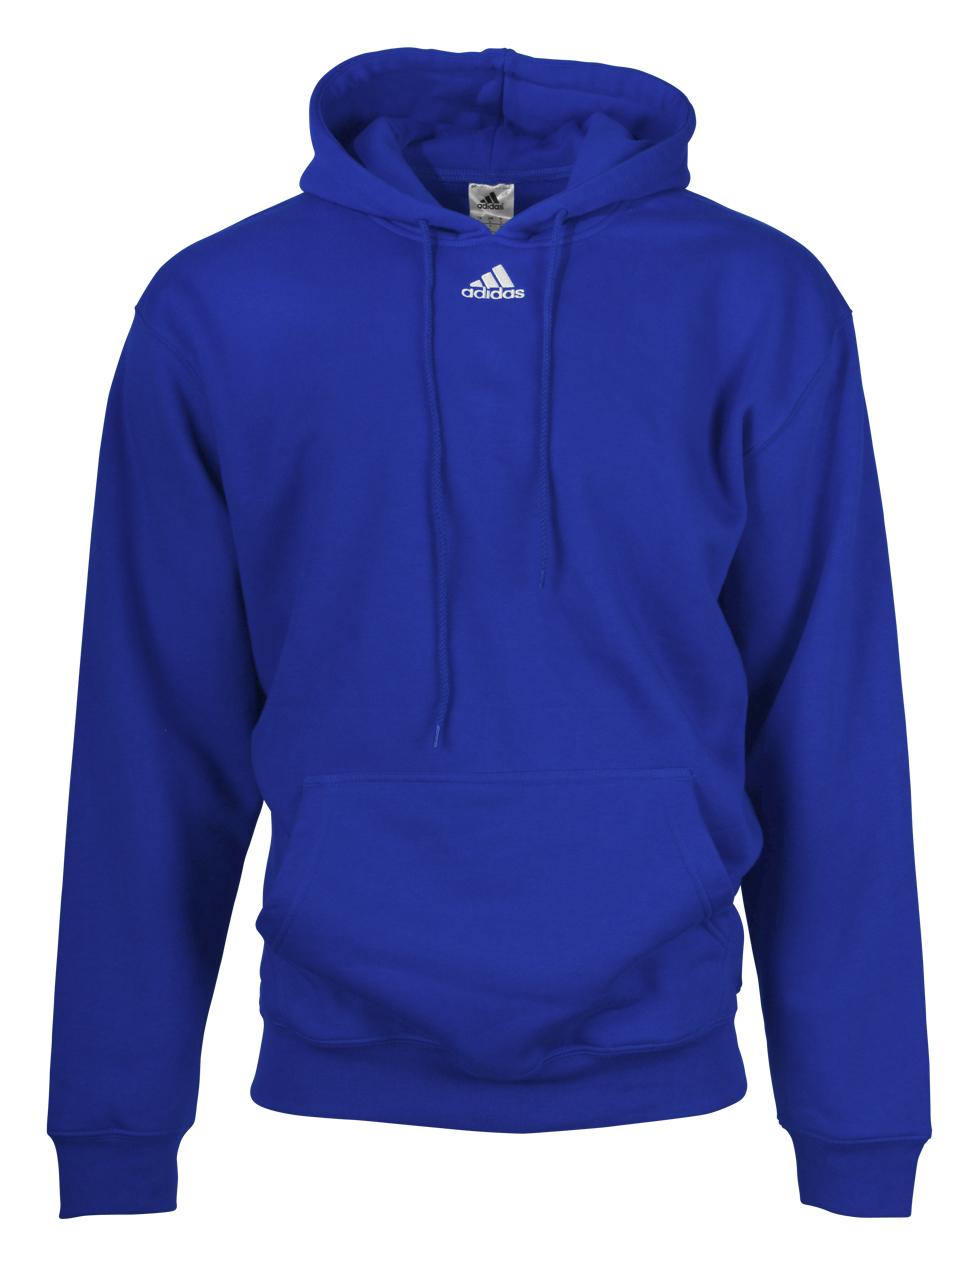 Picture of Adidas Adult Team Fleece Hoodie